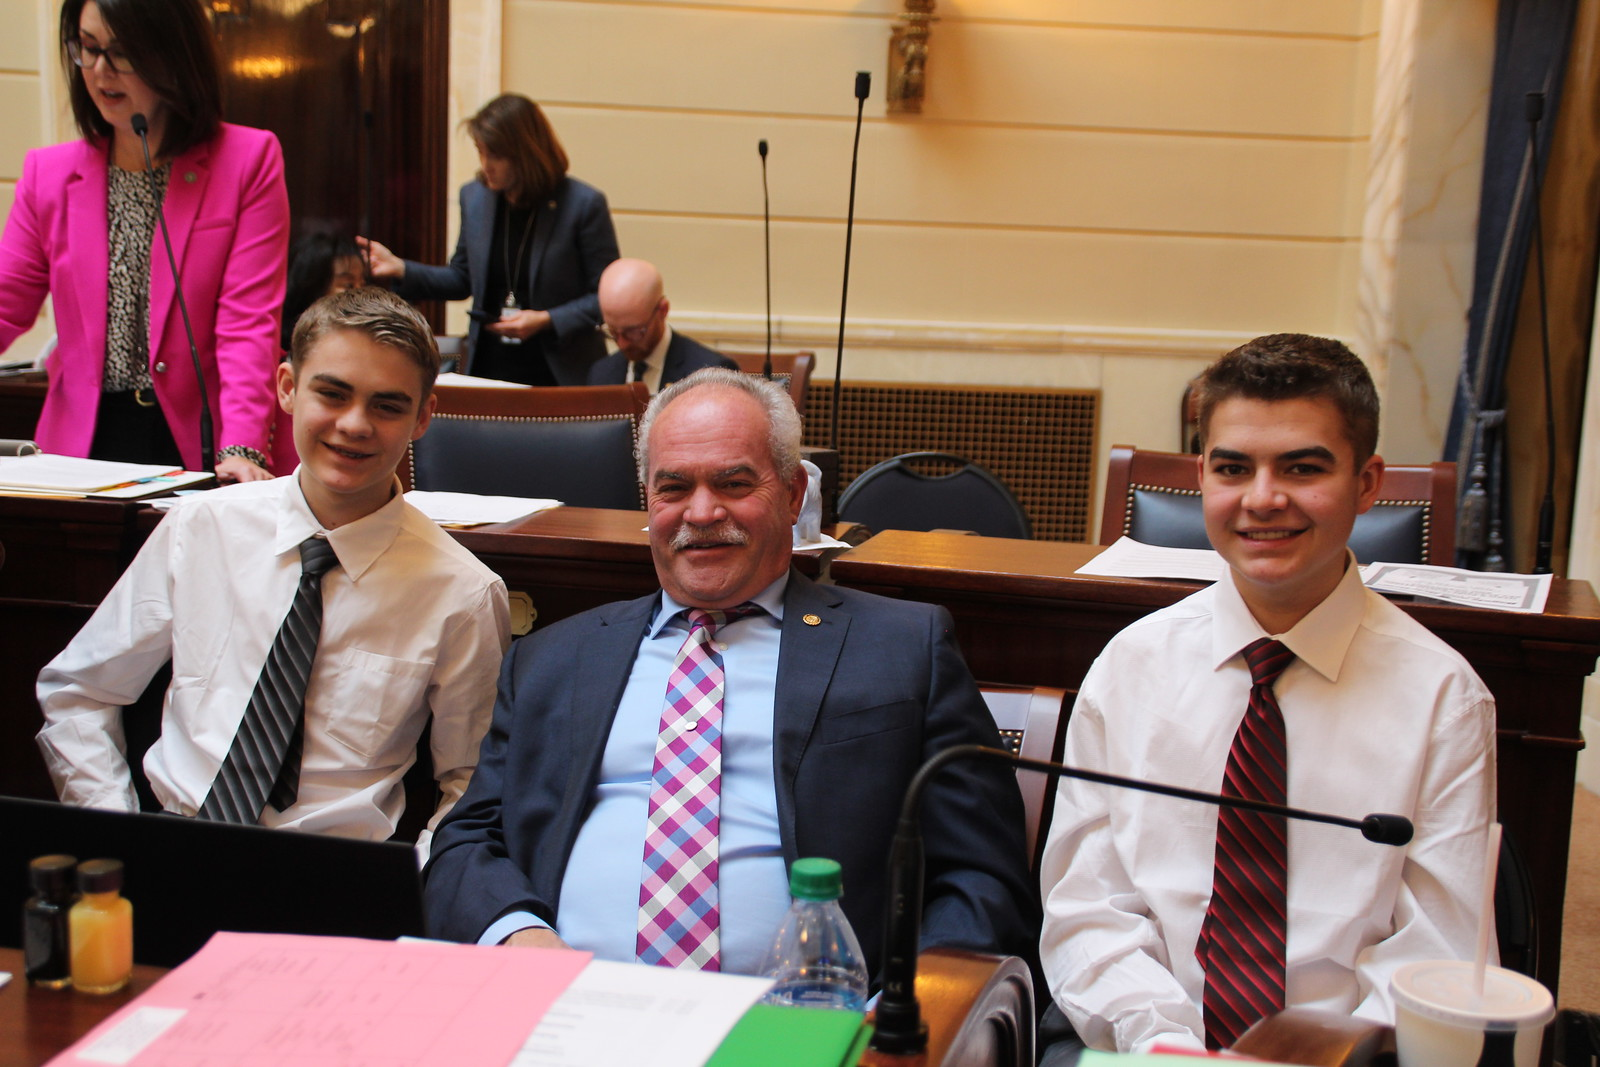 Senator Winterton with grandsons